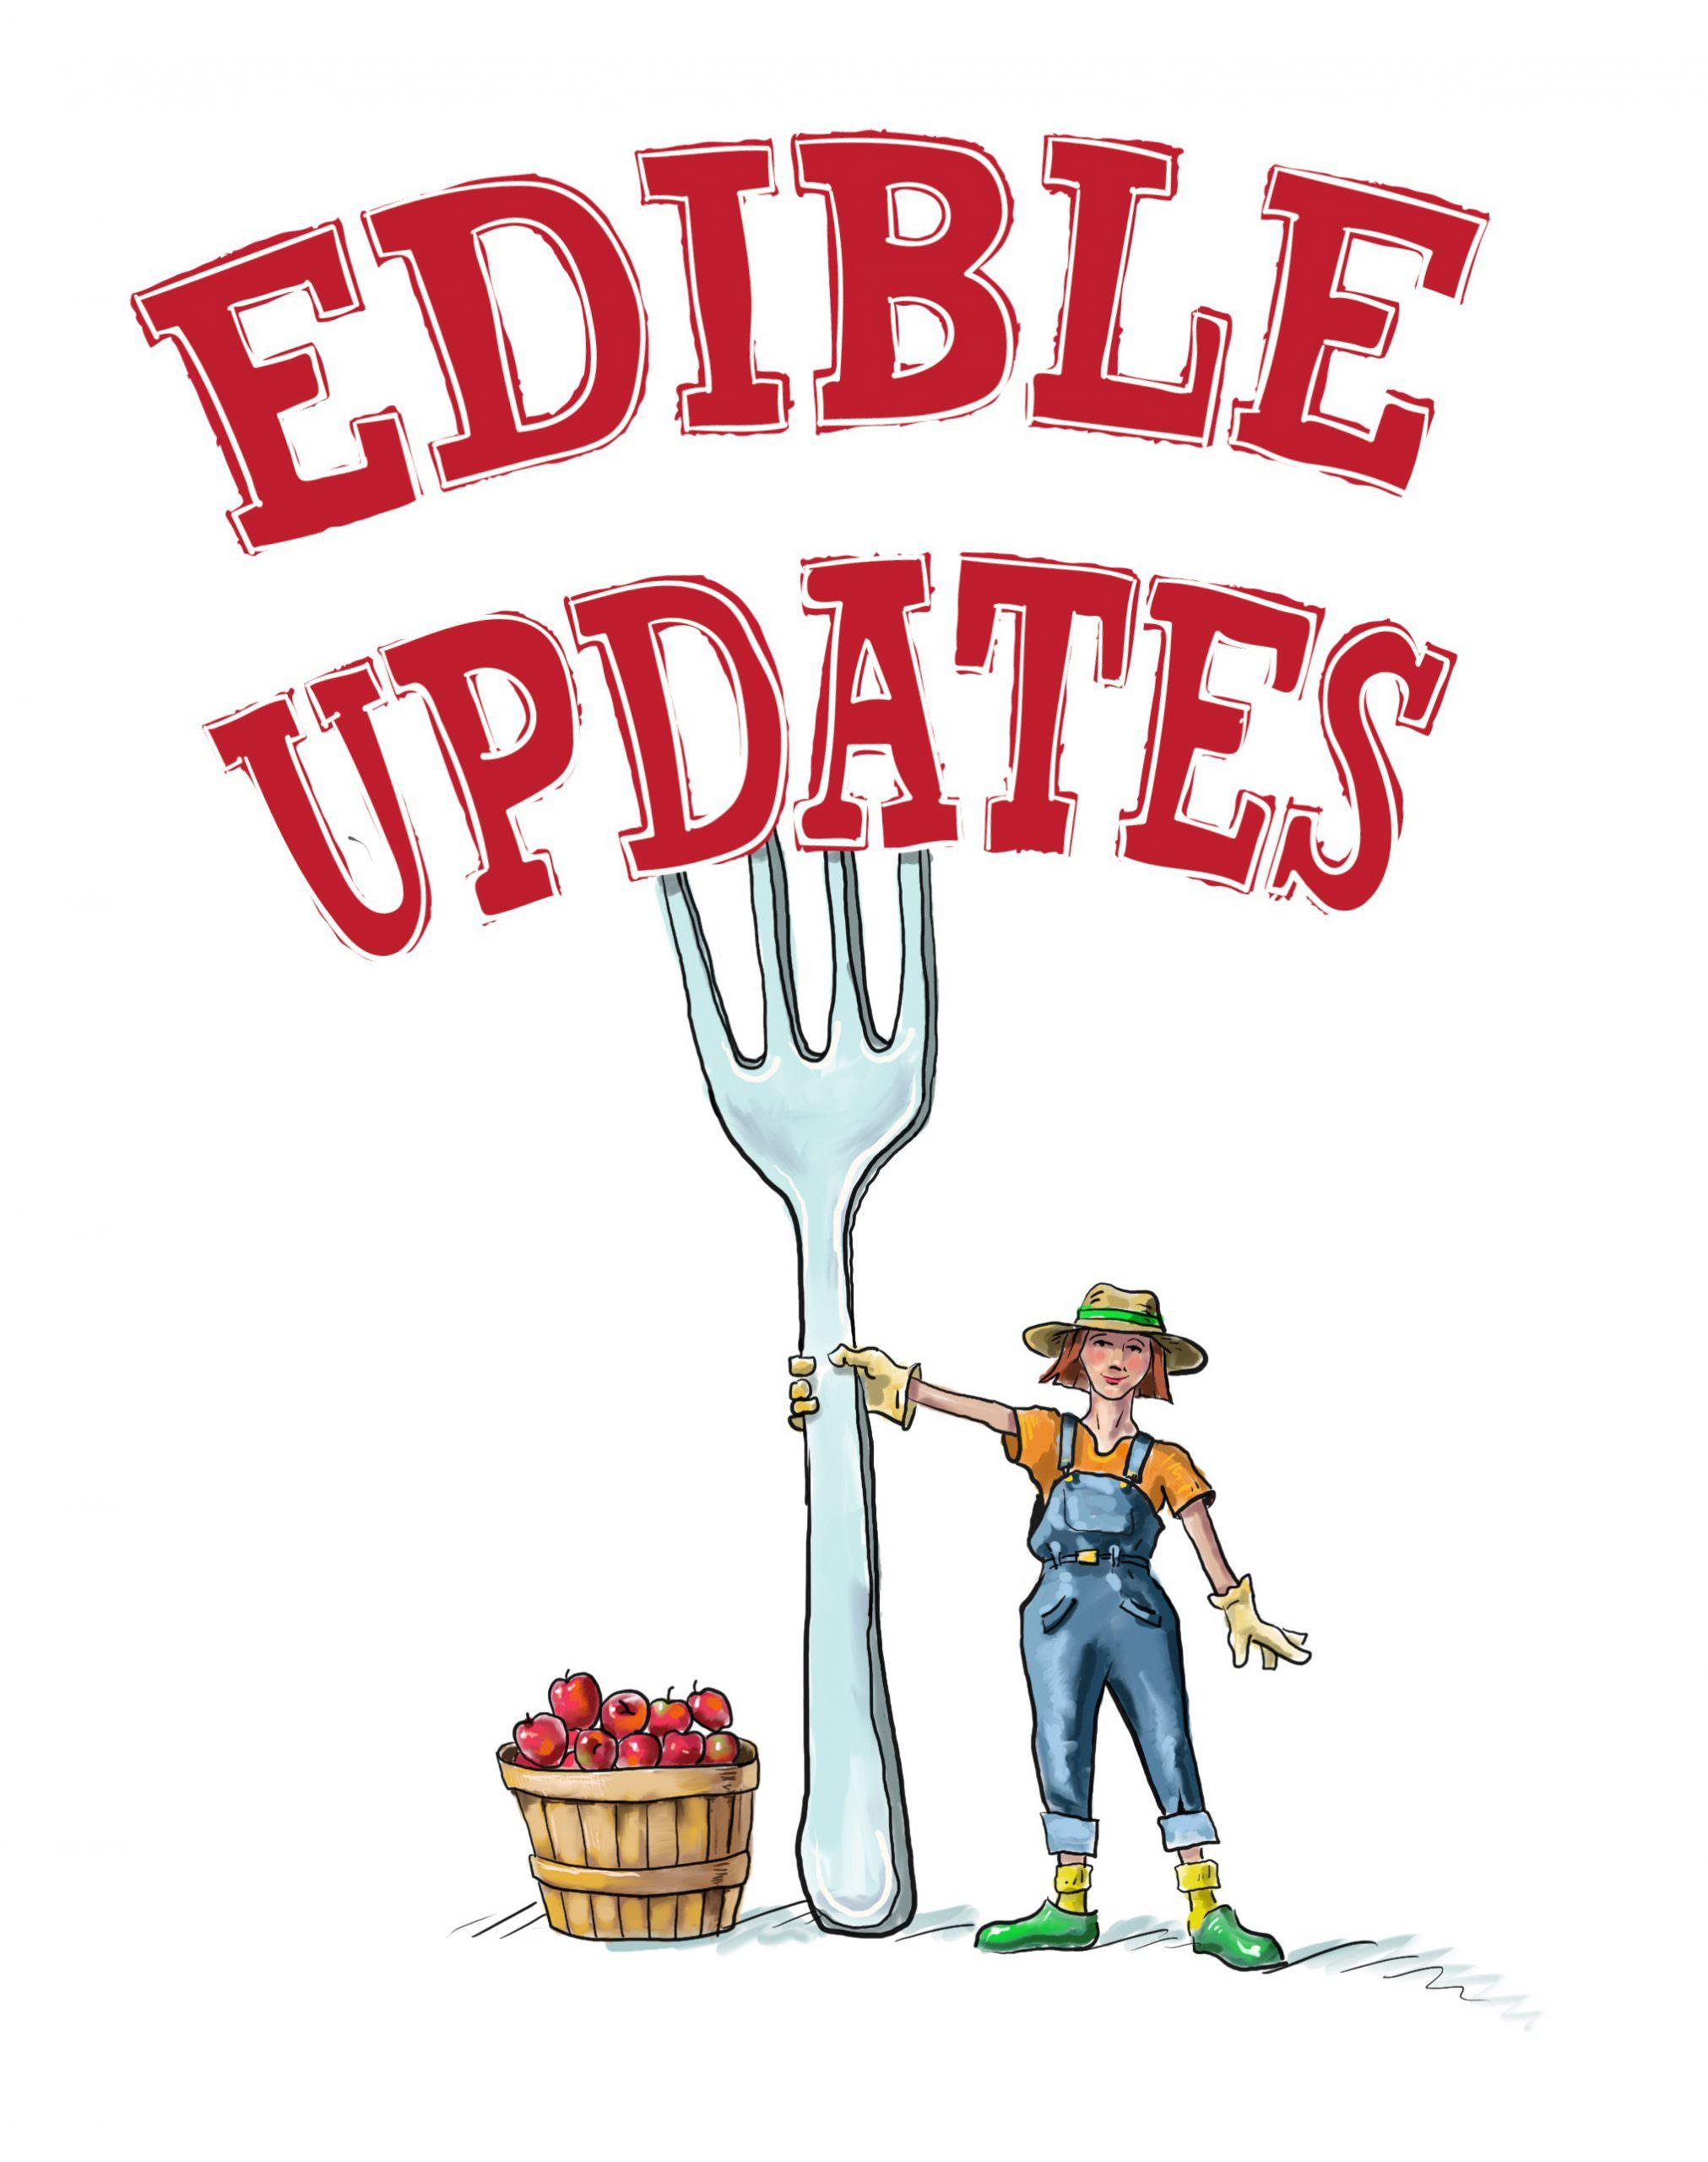 00 Illustration Edible Updates 2